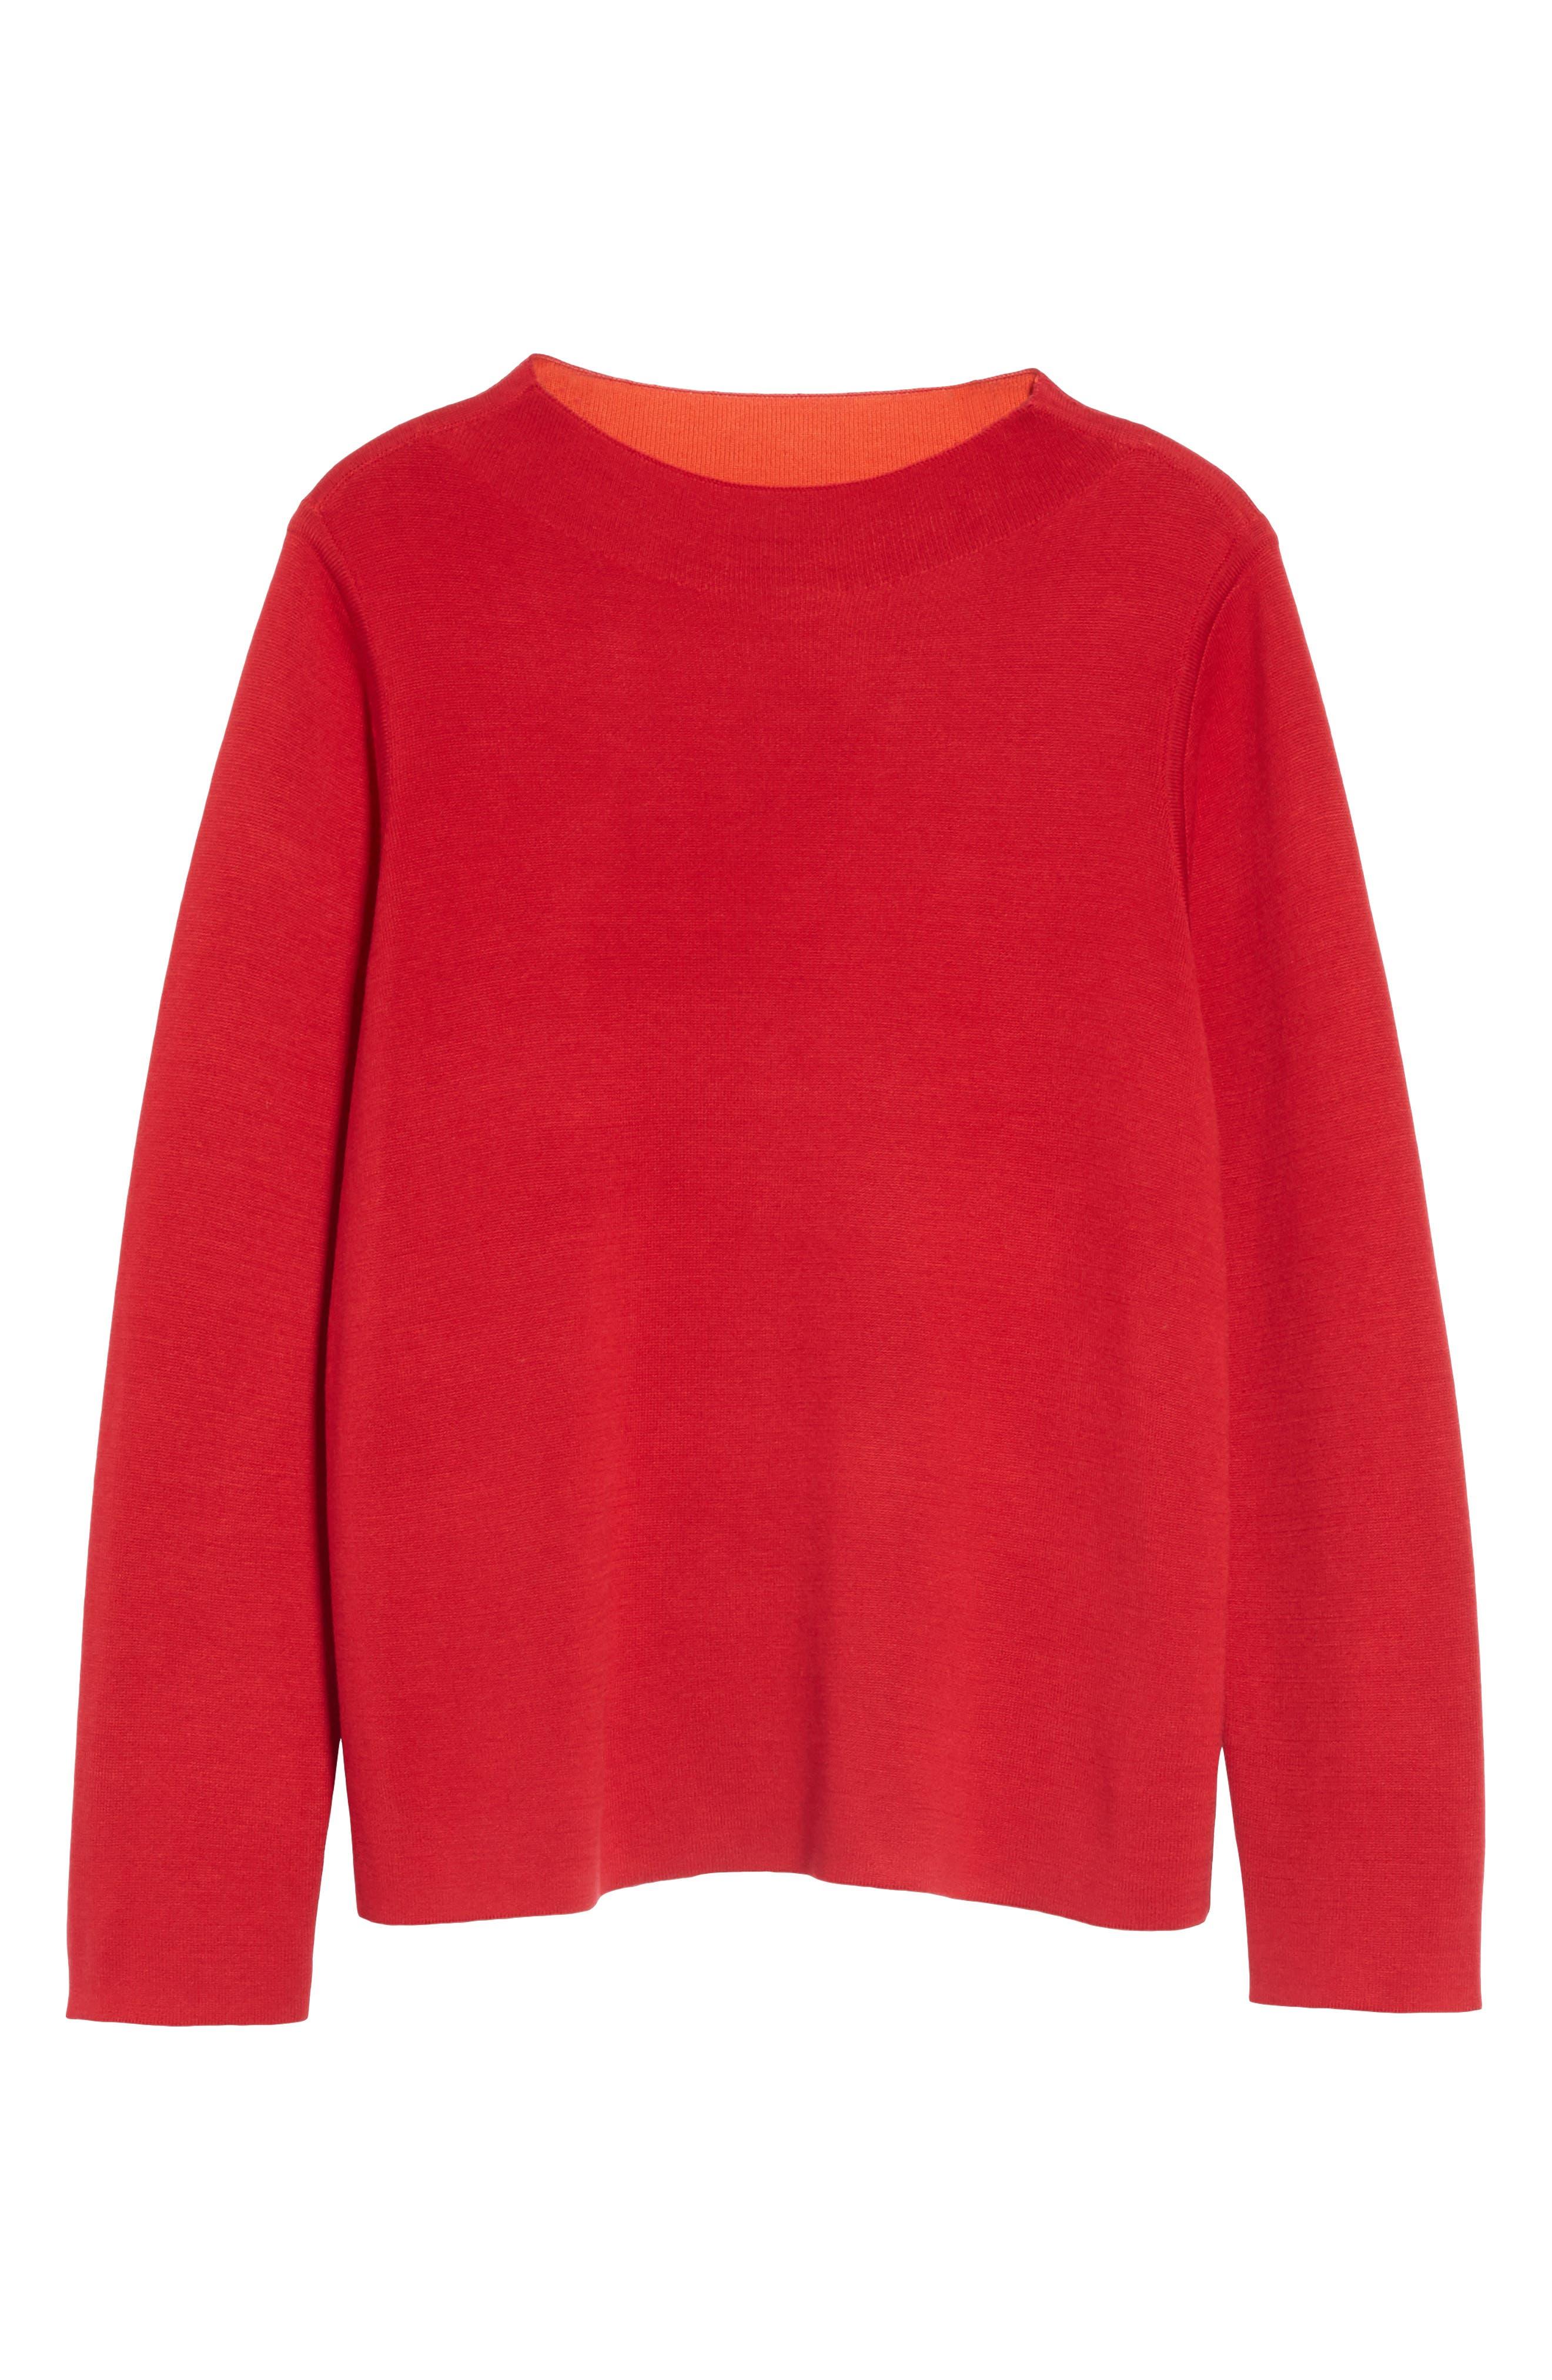 EILEEN FISHER, Reversilble Silk Blend Sweater, Alternate thumbnail 7, color, LACQUER